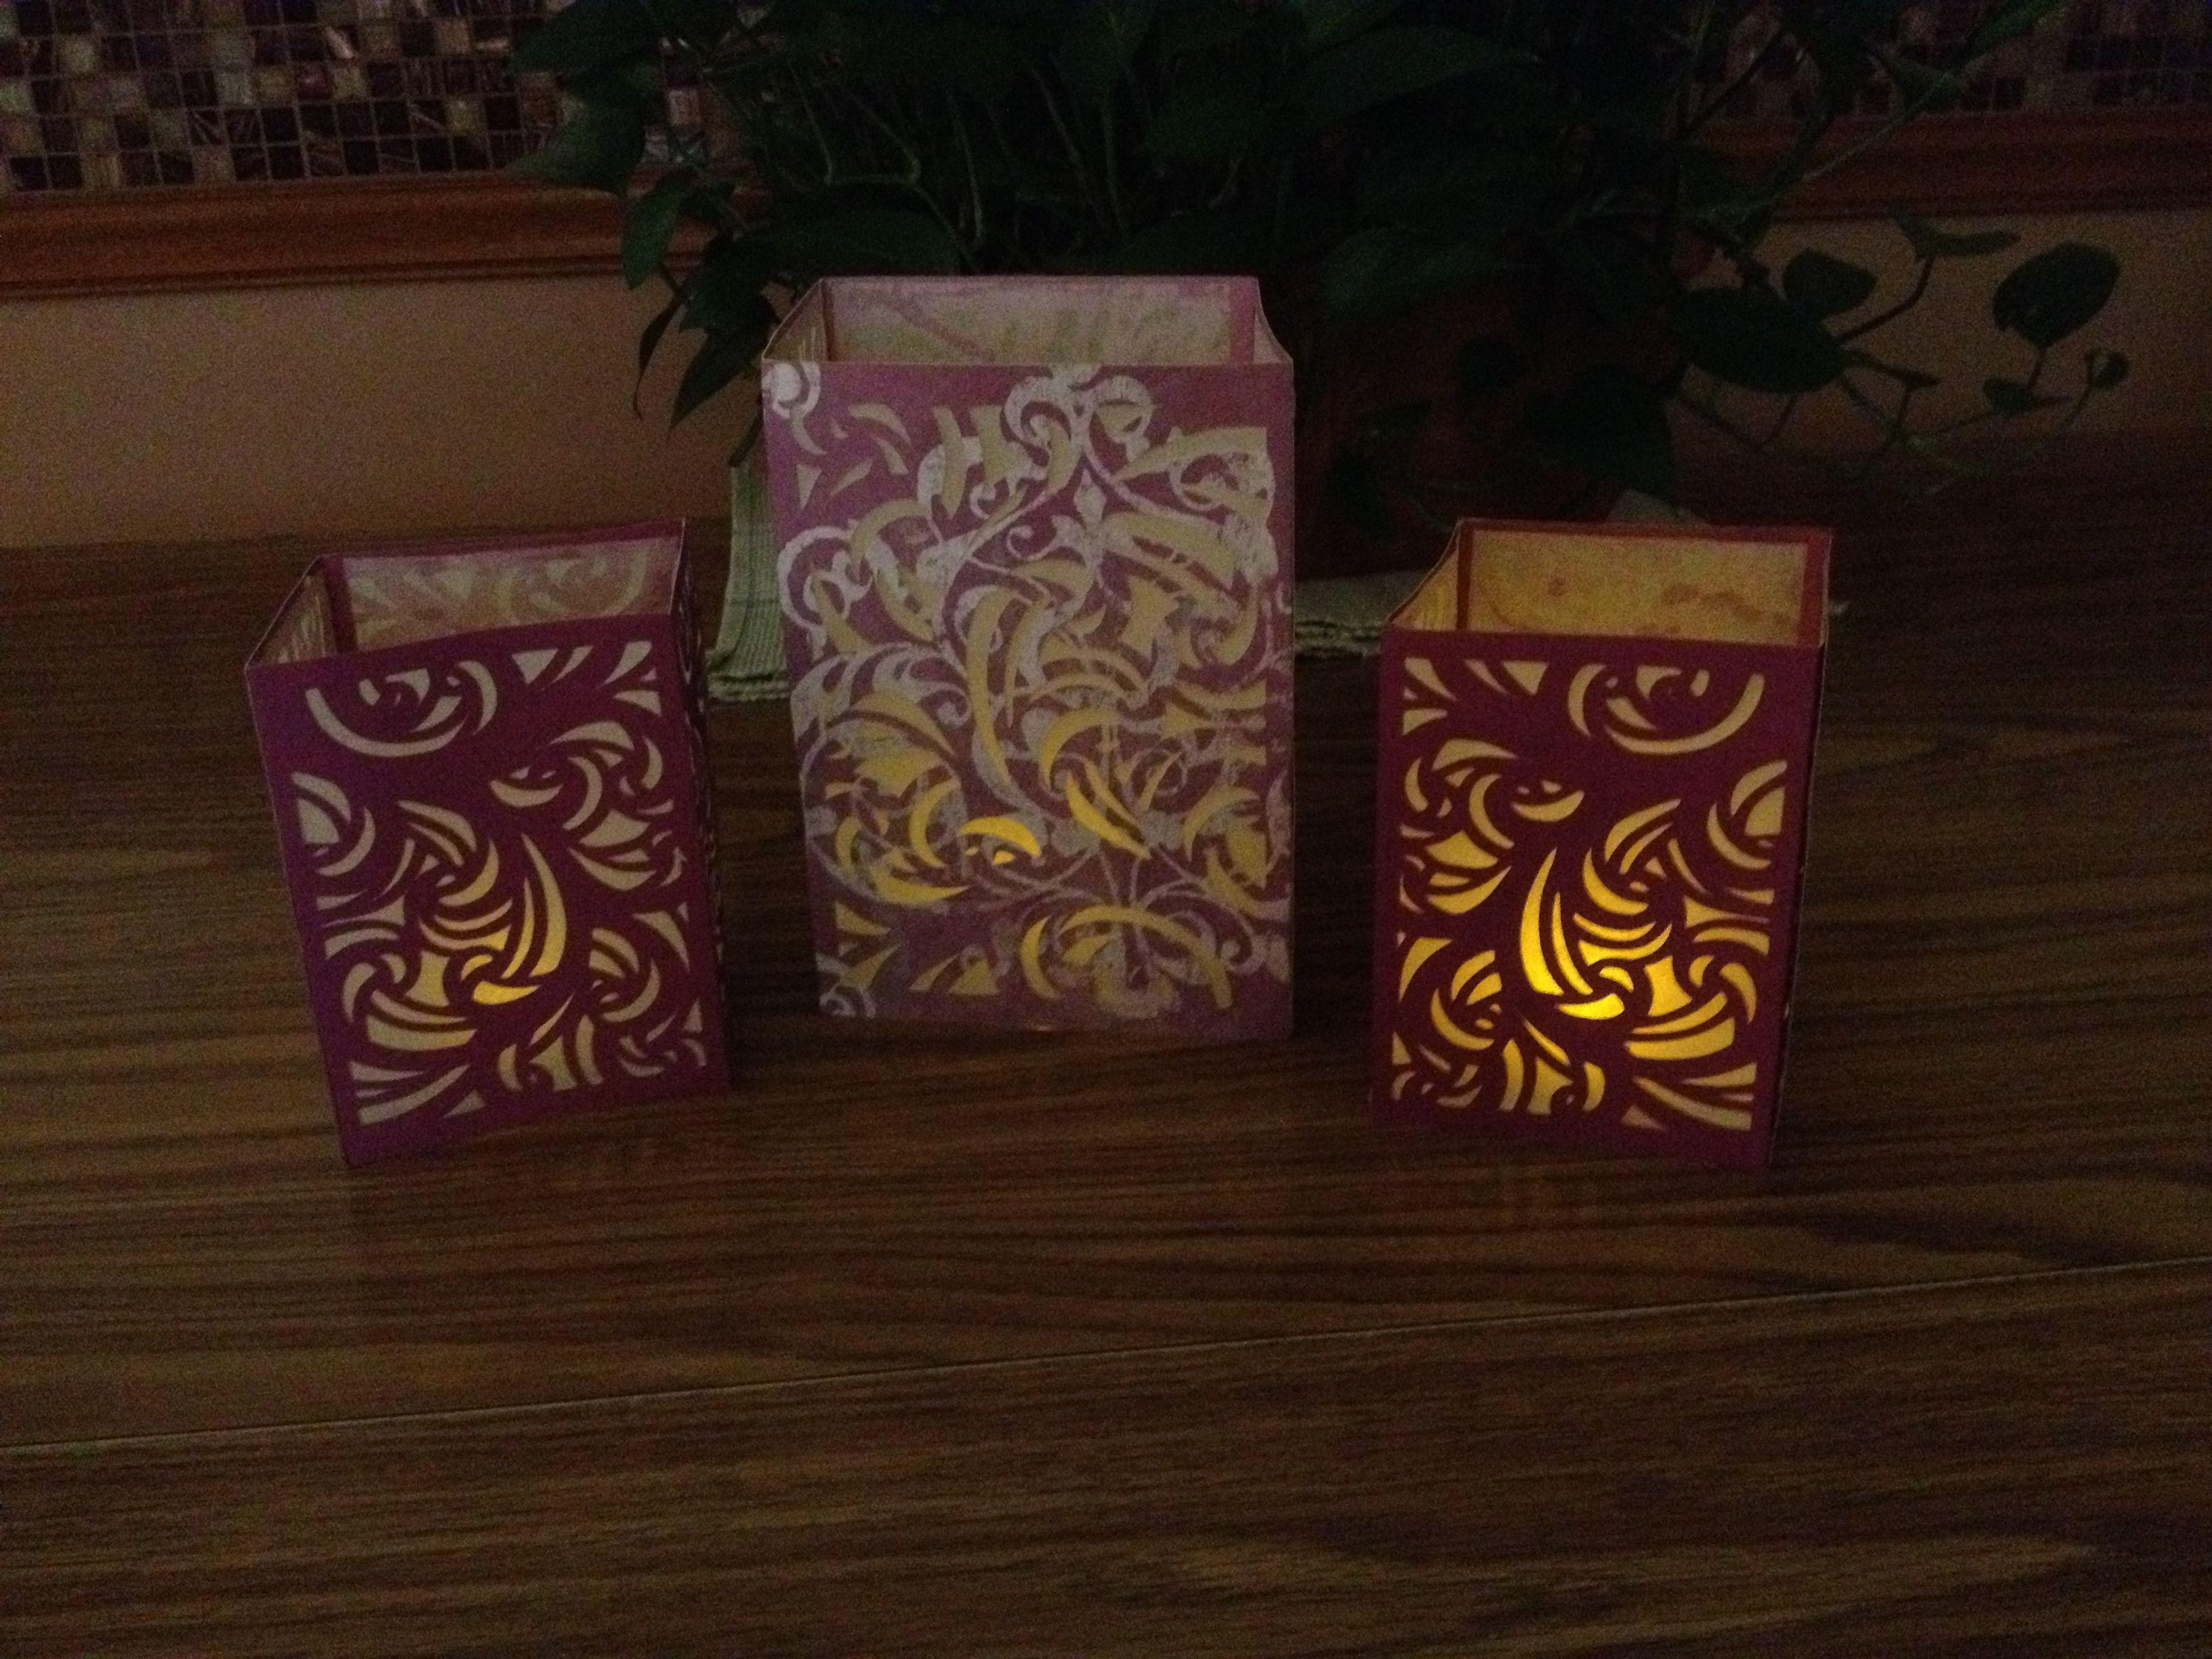 Cricut Craft Room 3D Lanterns Use tracing paper instead of vellum